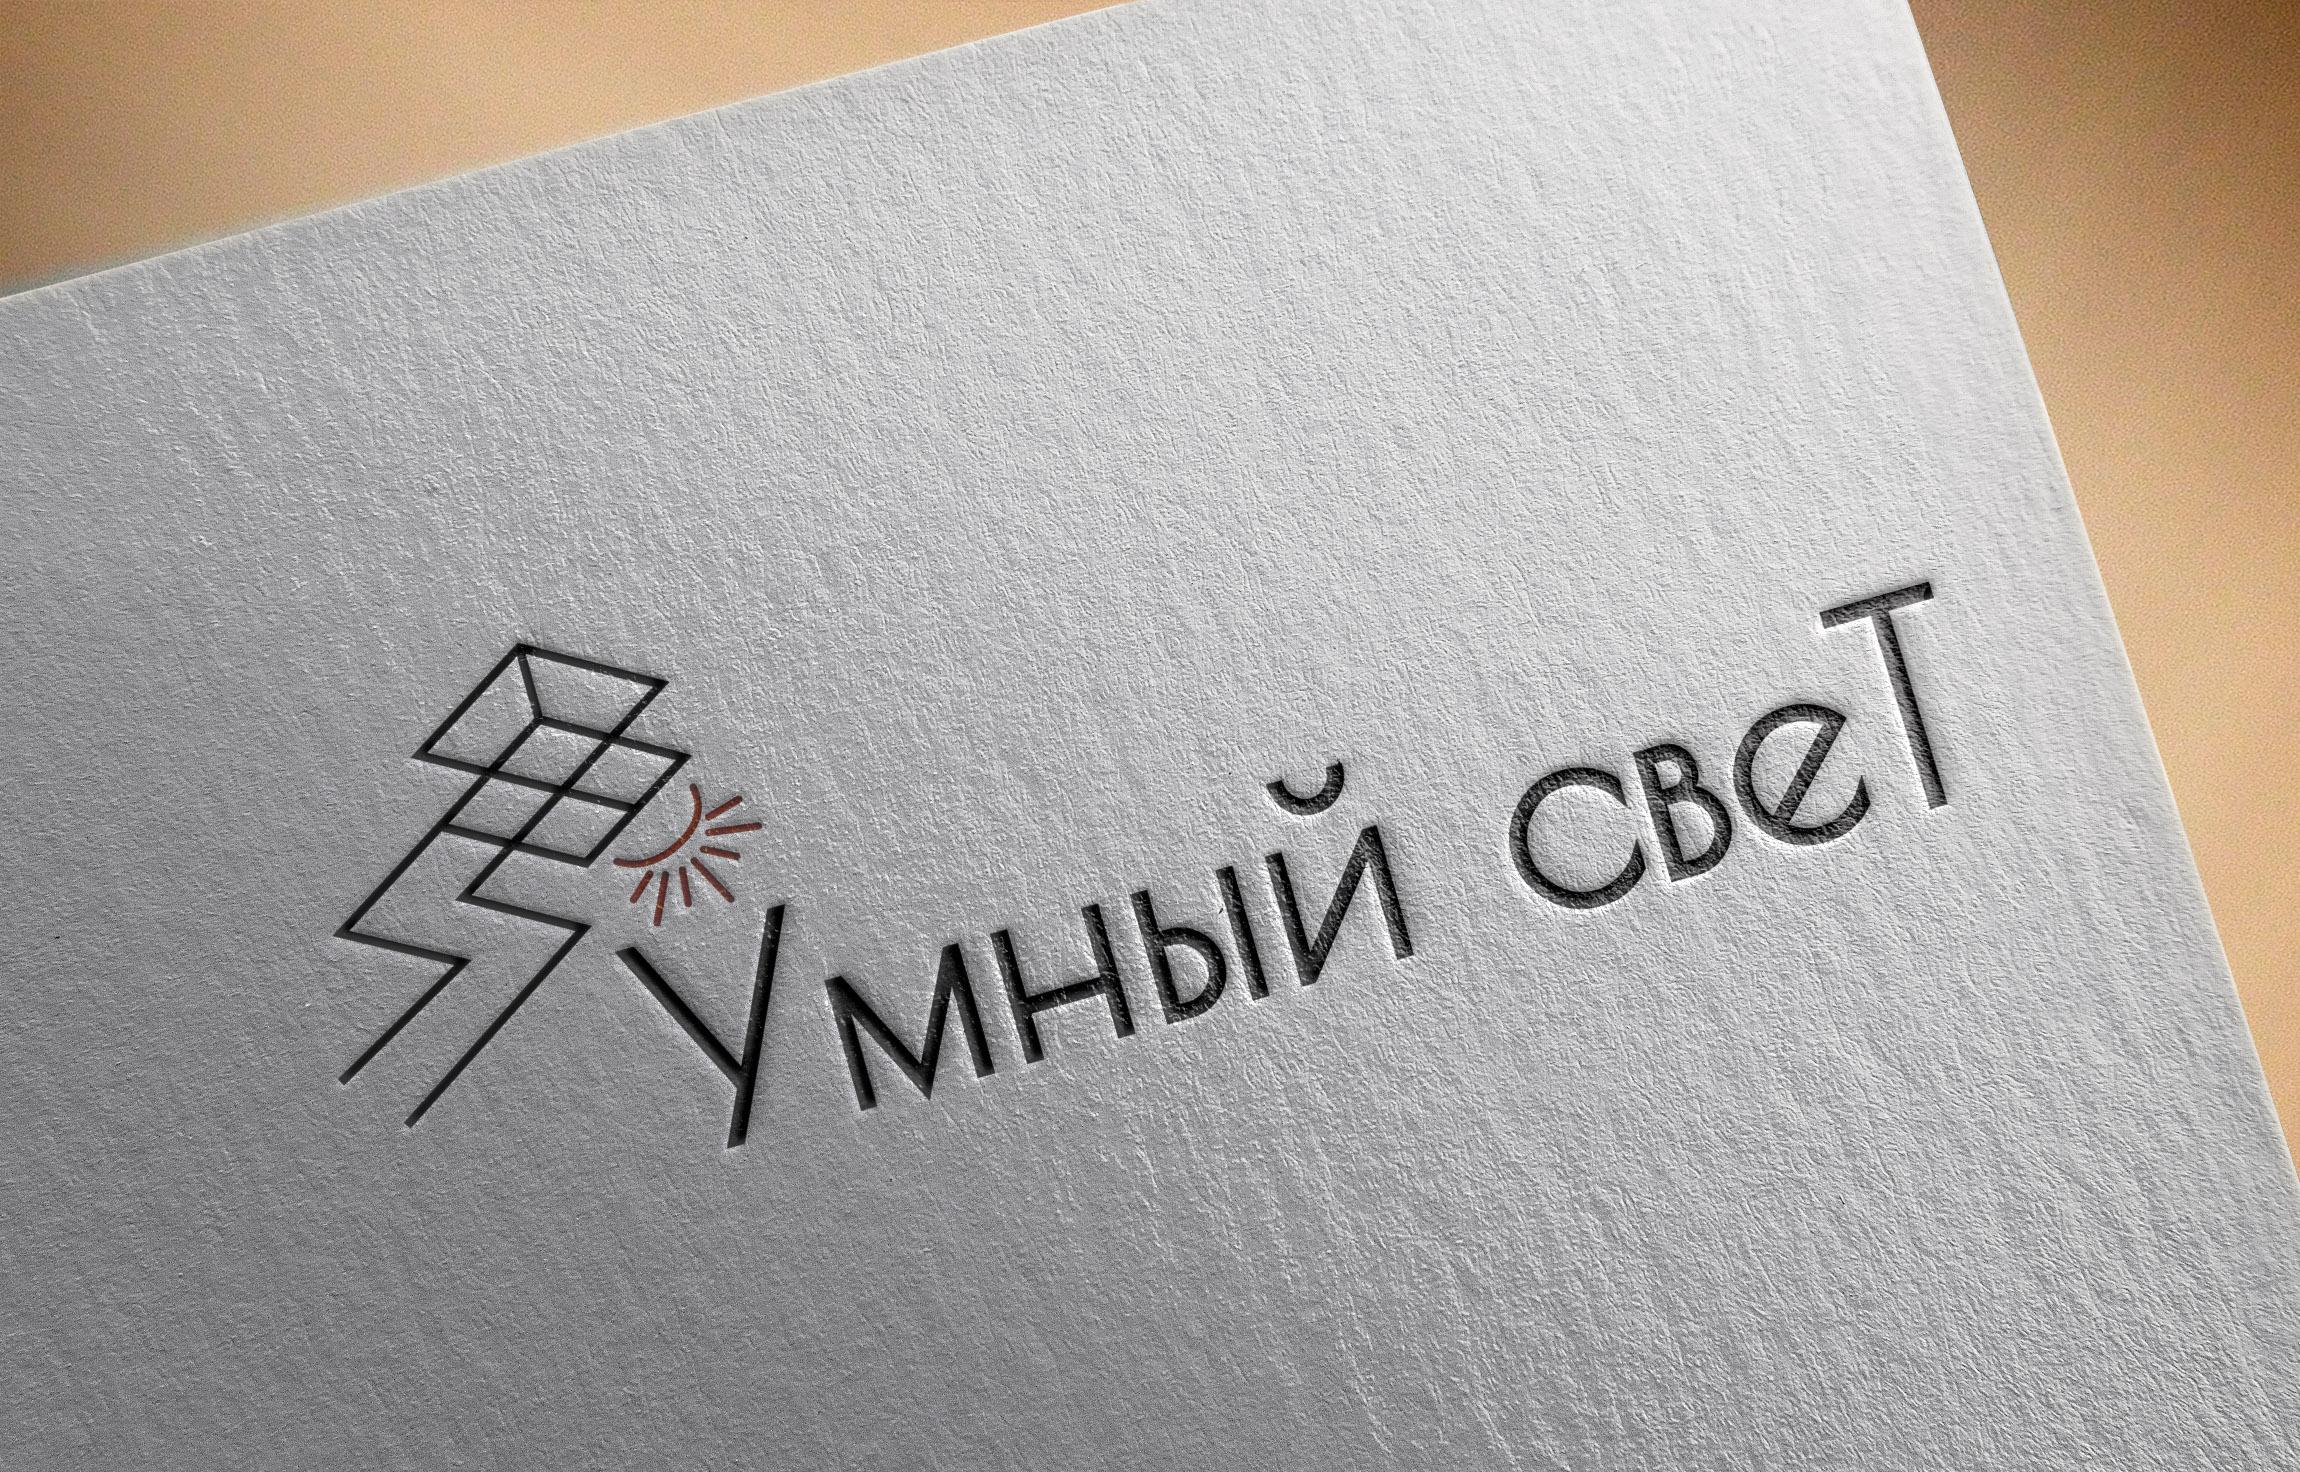 Логотип для салон-магазина освещения фото f_1785d014ba601cc5.jpg